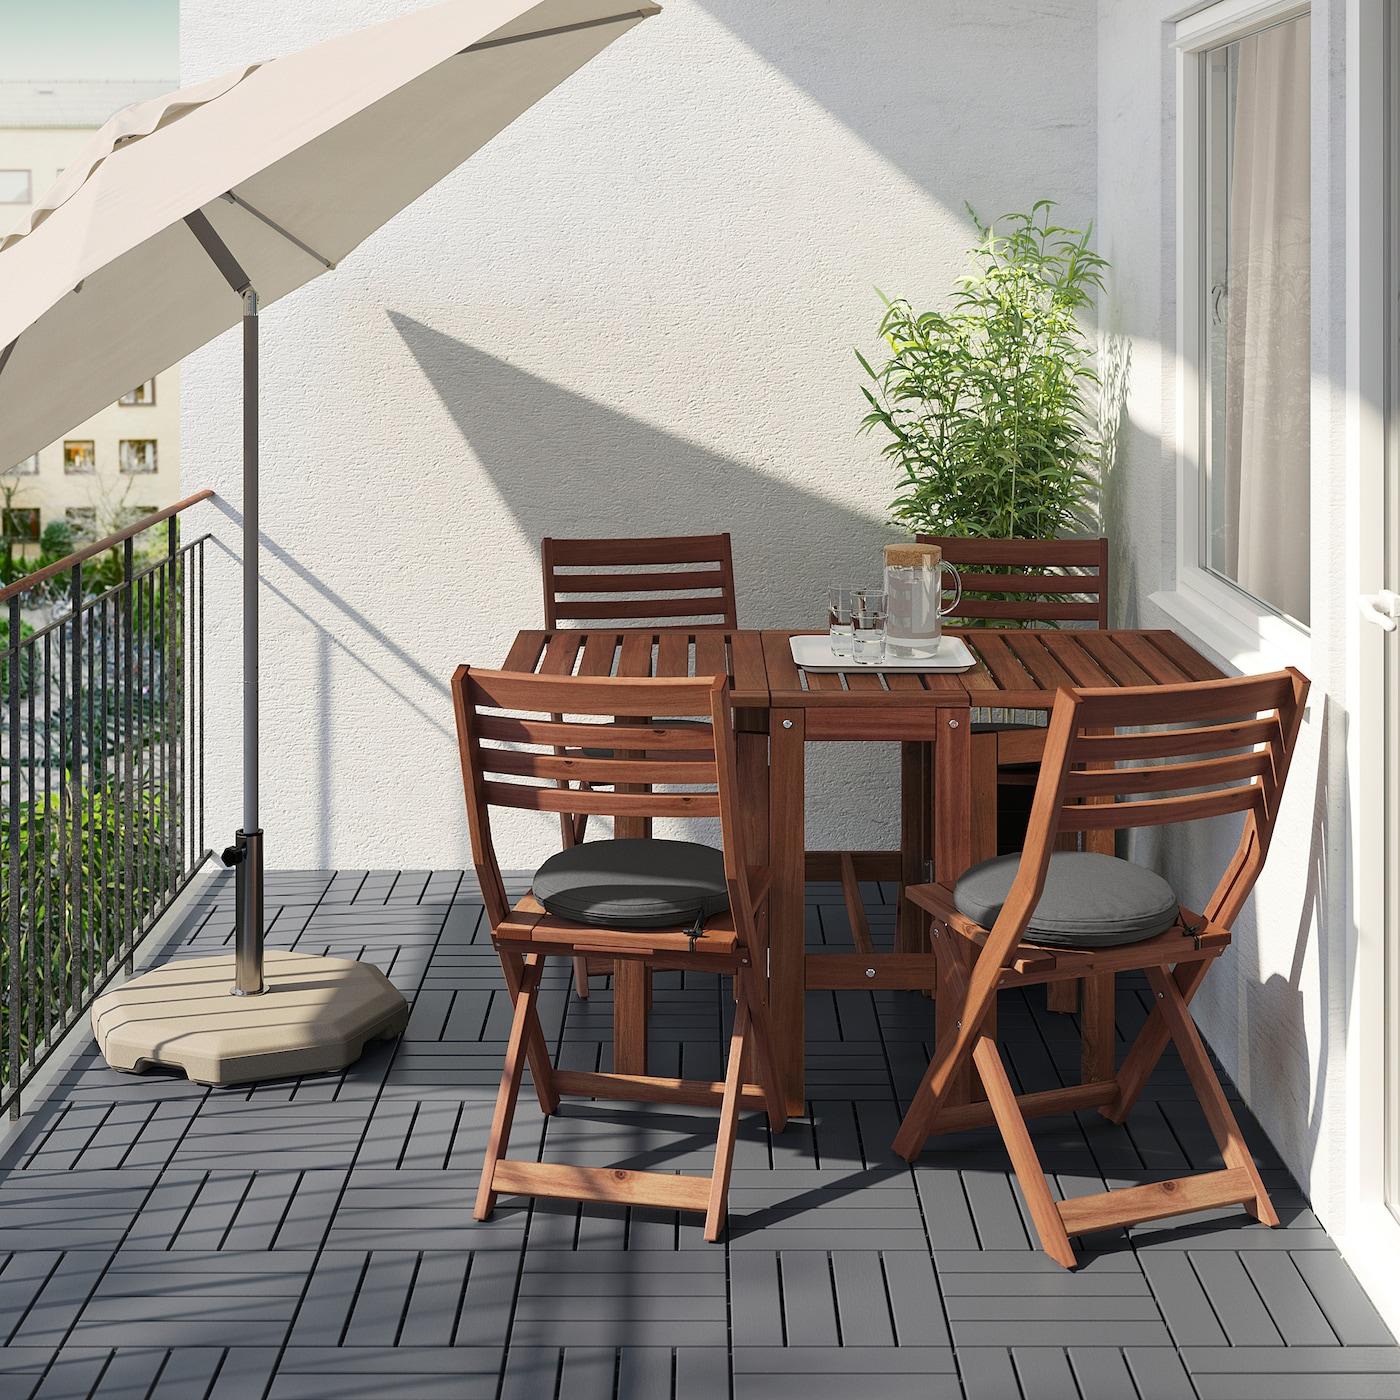 ÄPPLARÖ طاولة+4 كراسي قابلة للطي، خارجية, صباغ بني/Frösön/Duvholmen رمادي غامق